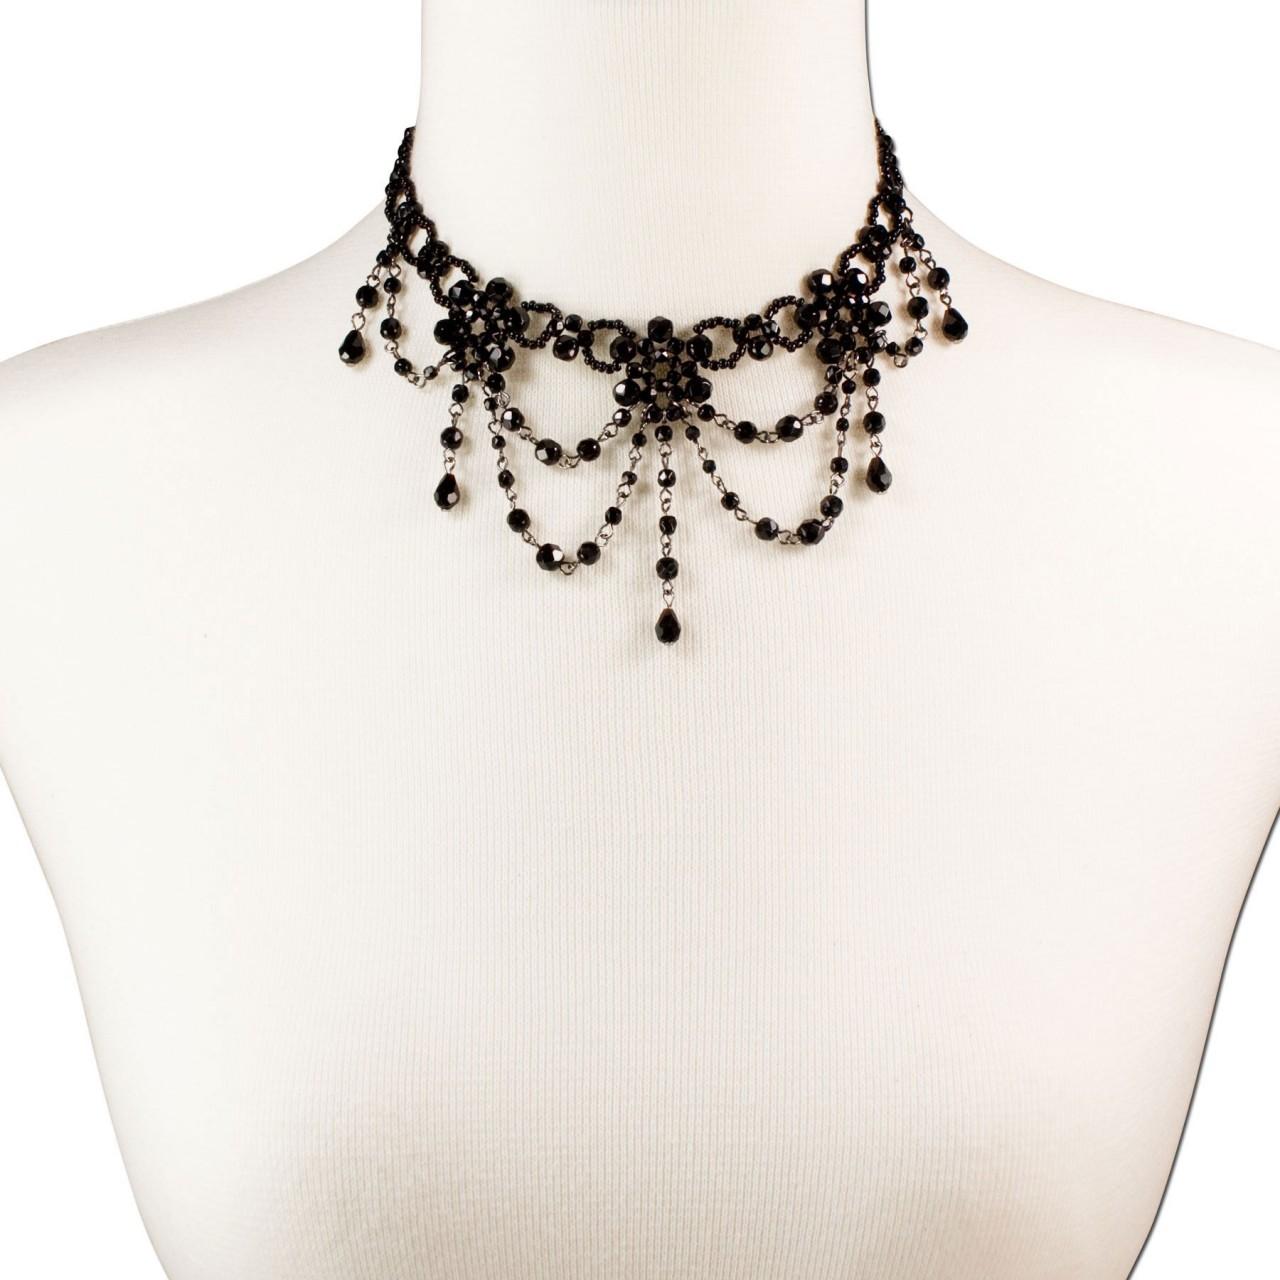 Perlenkropfkette Annabelle schwarz